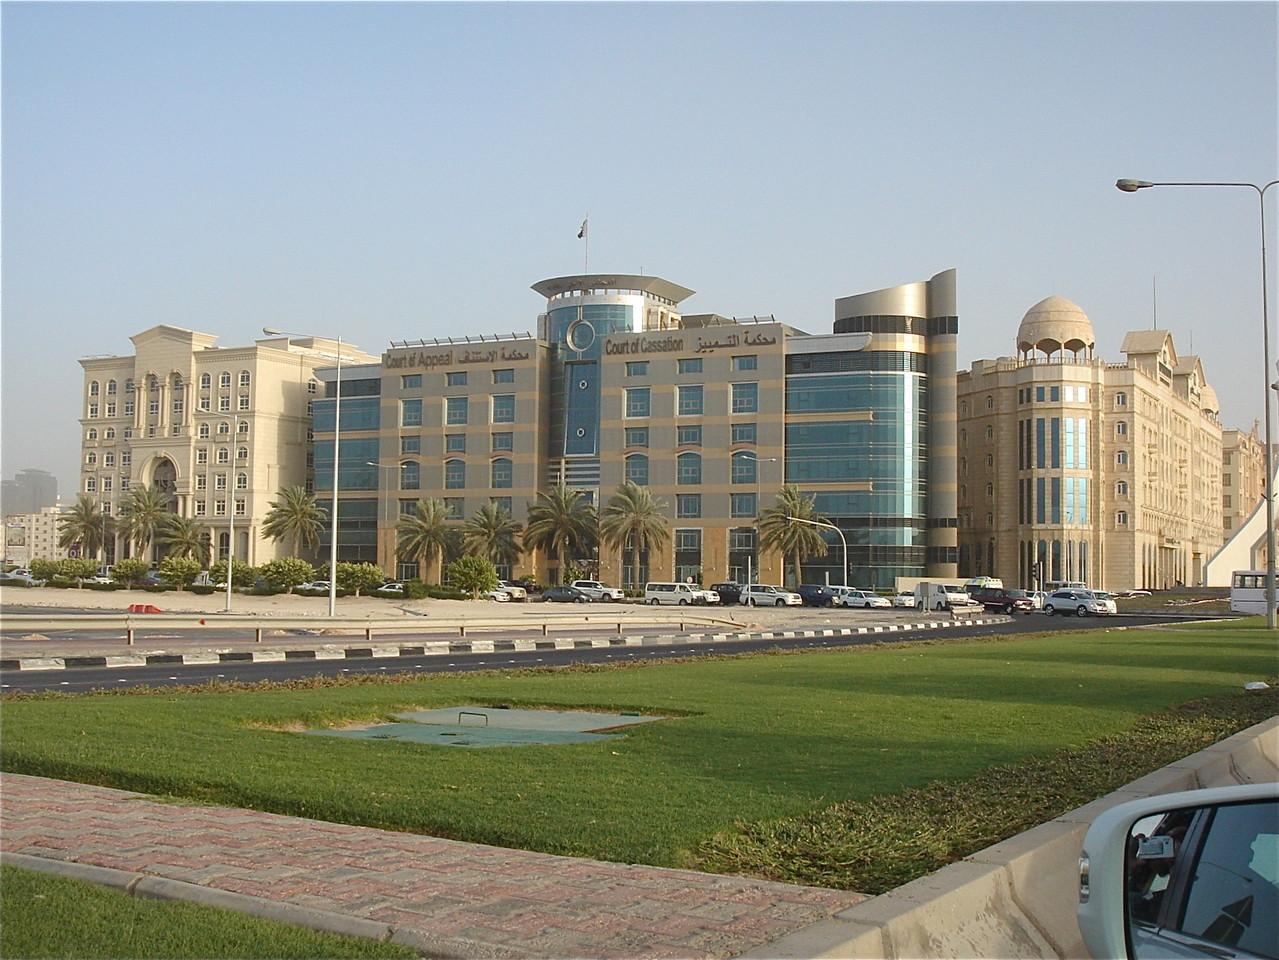 Court of Appeal, Court of Cassation, Doha, Qatar